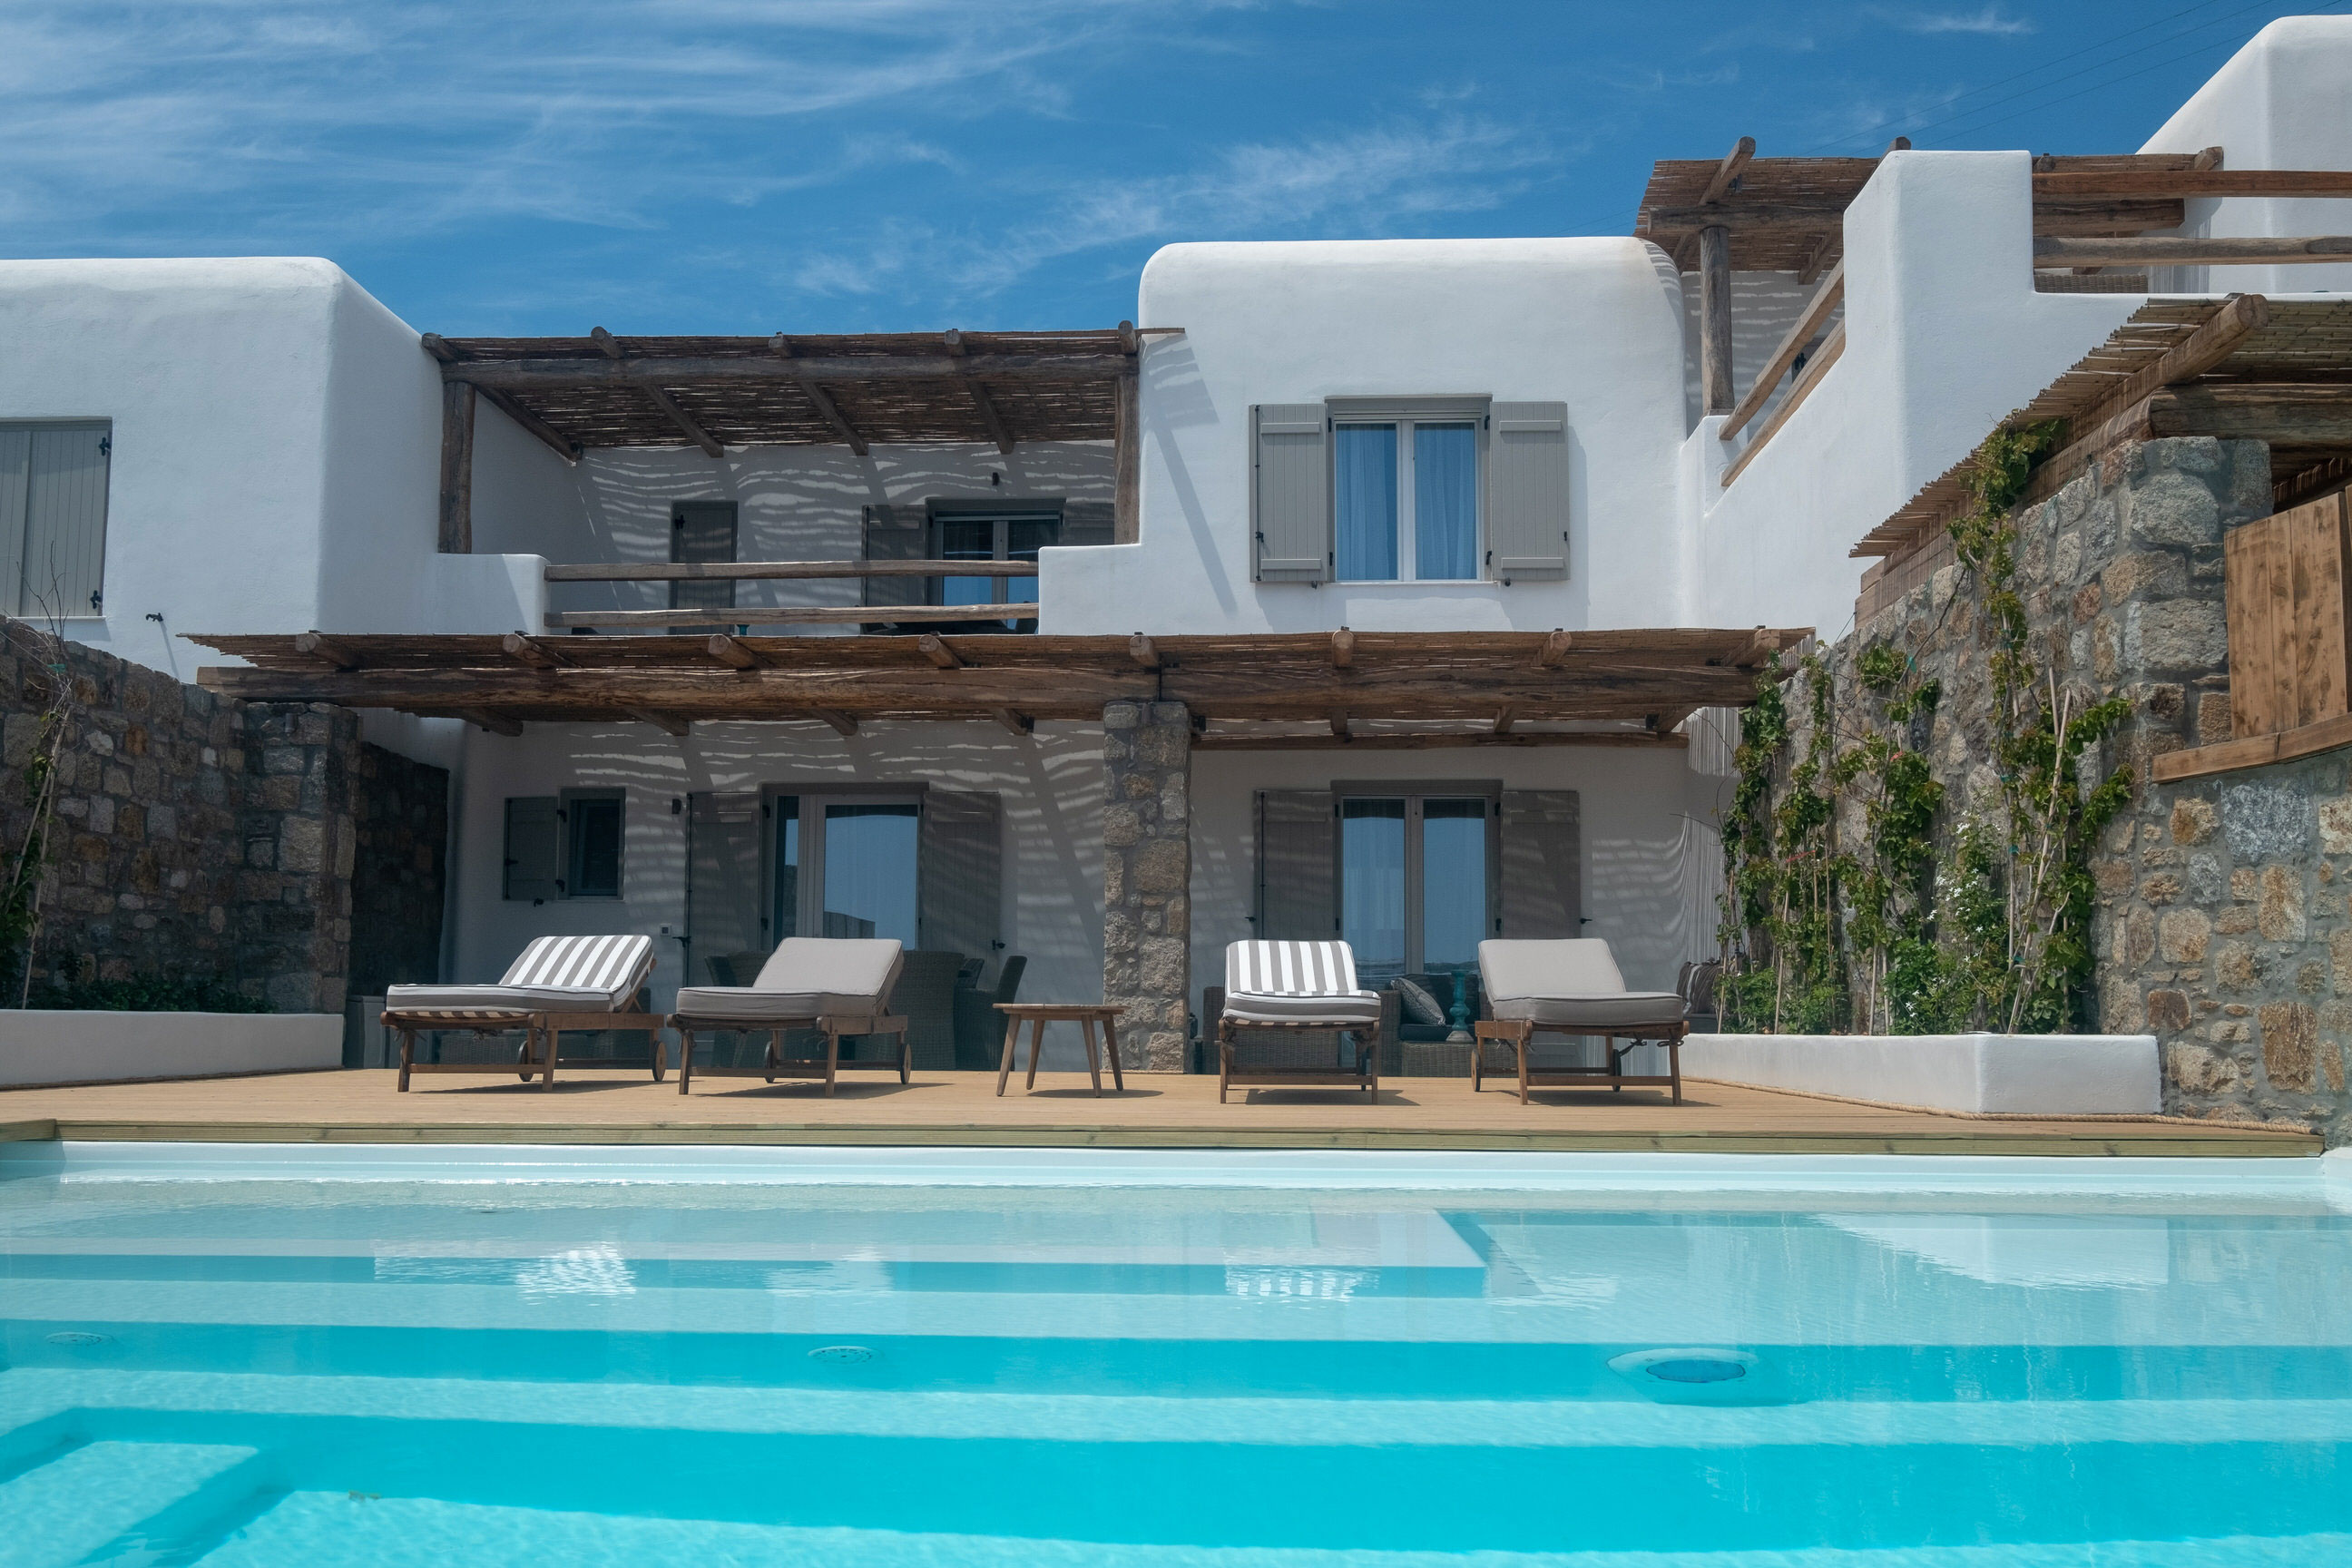 Mykonos Villa Verve III jumbotron image